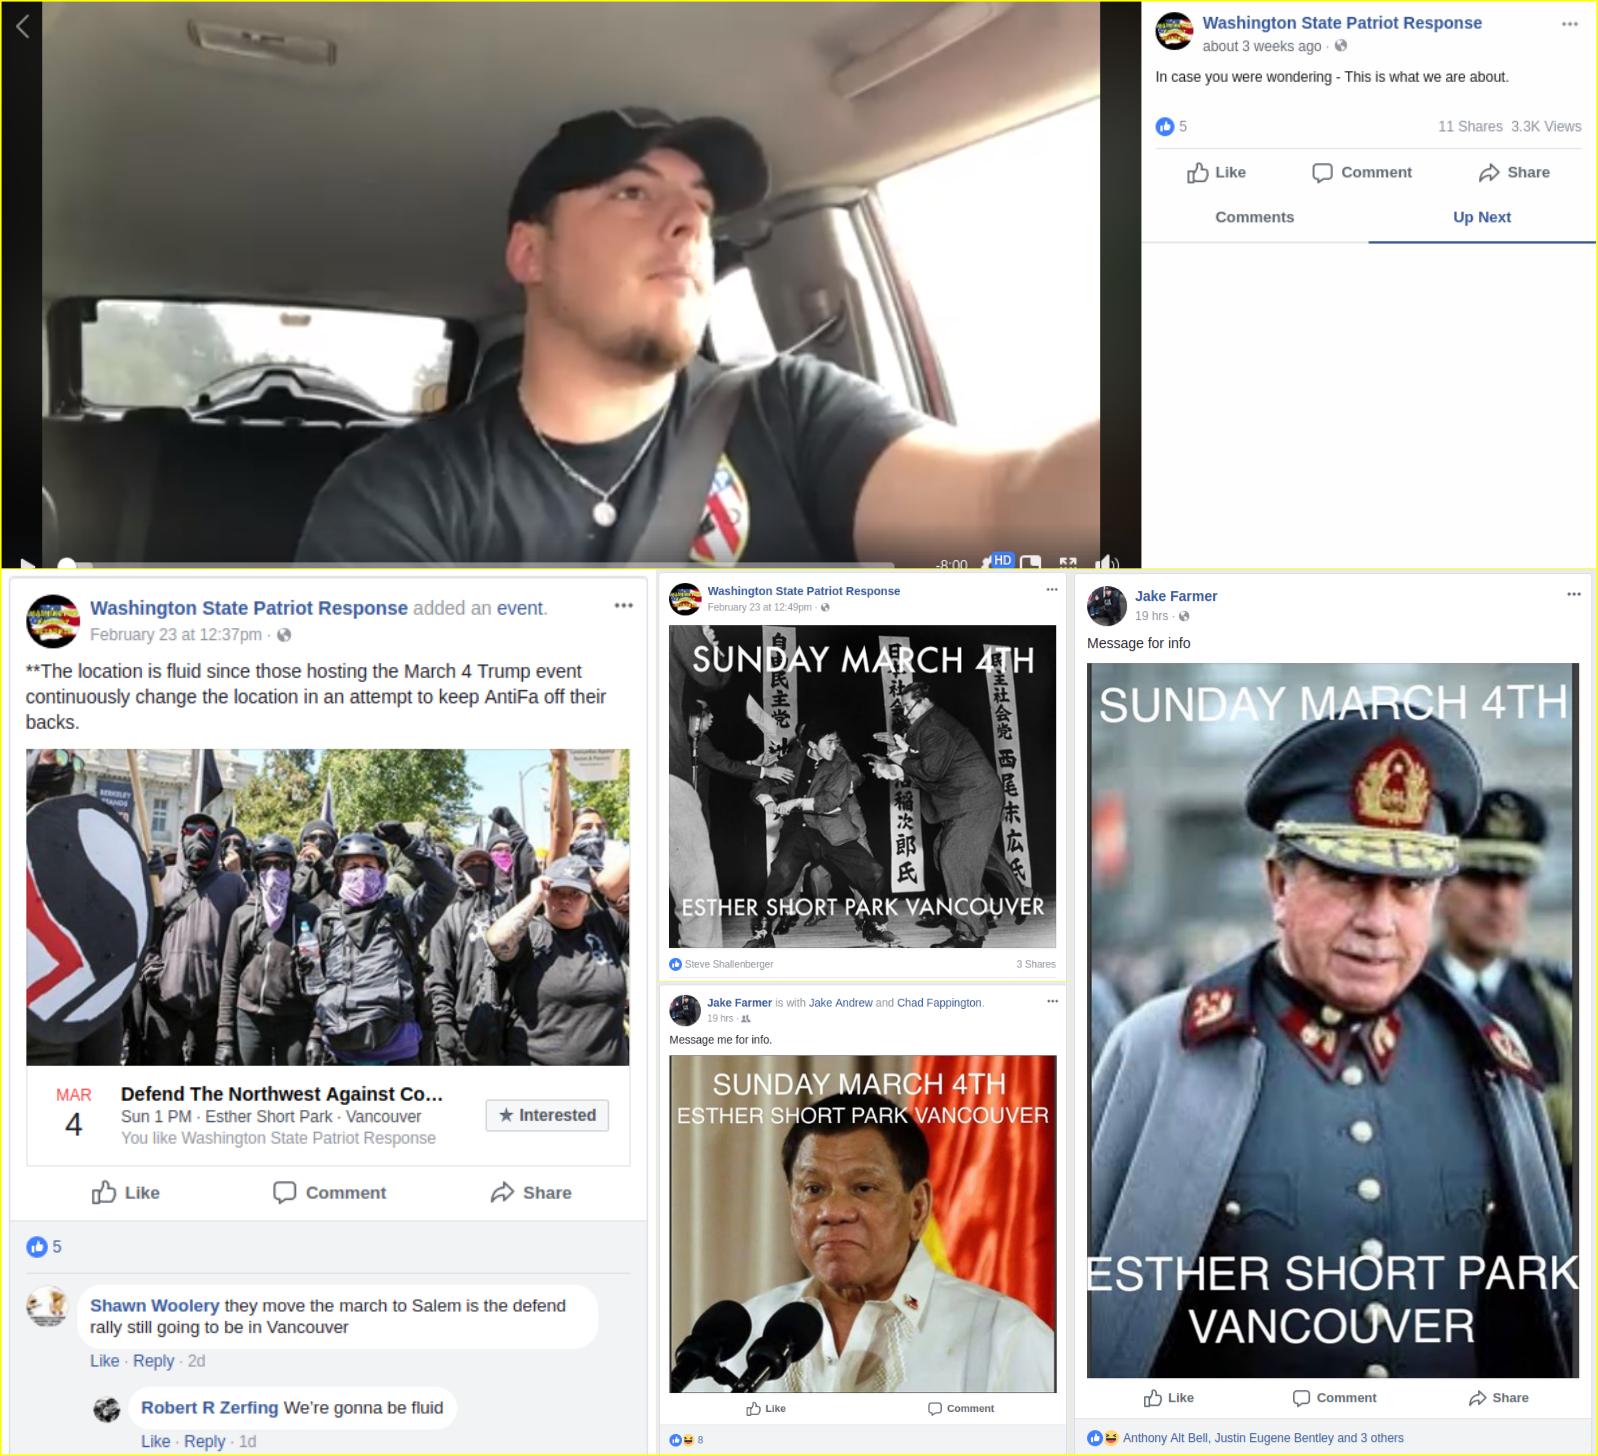 Robert Zerfing celebrates fascist murders